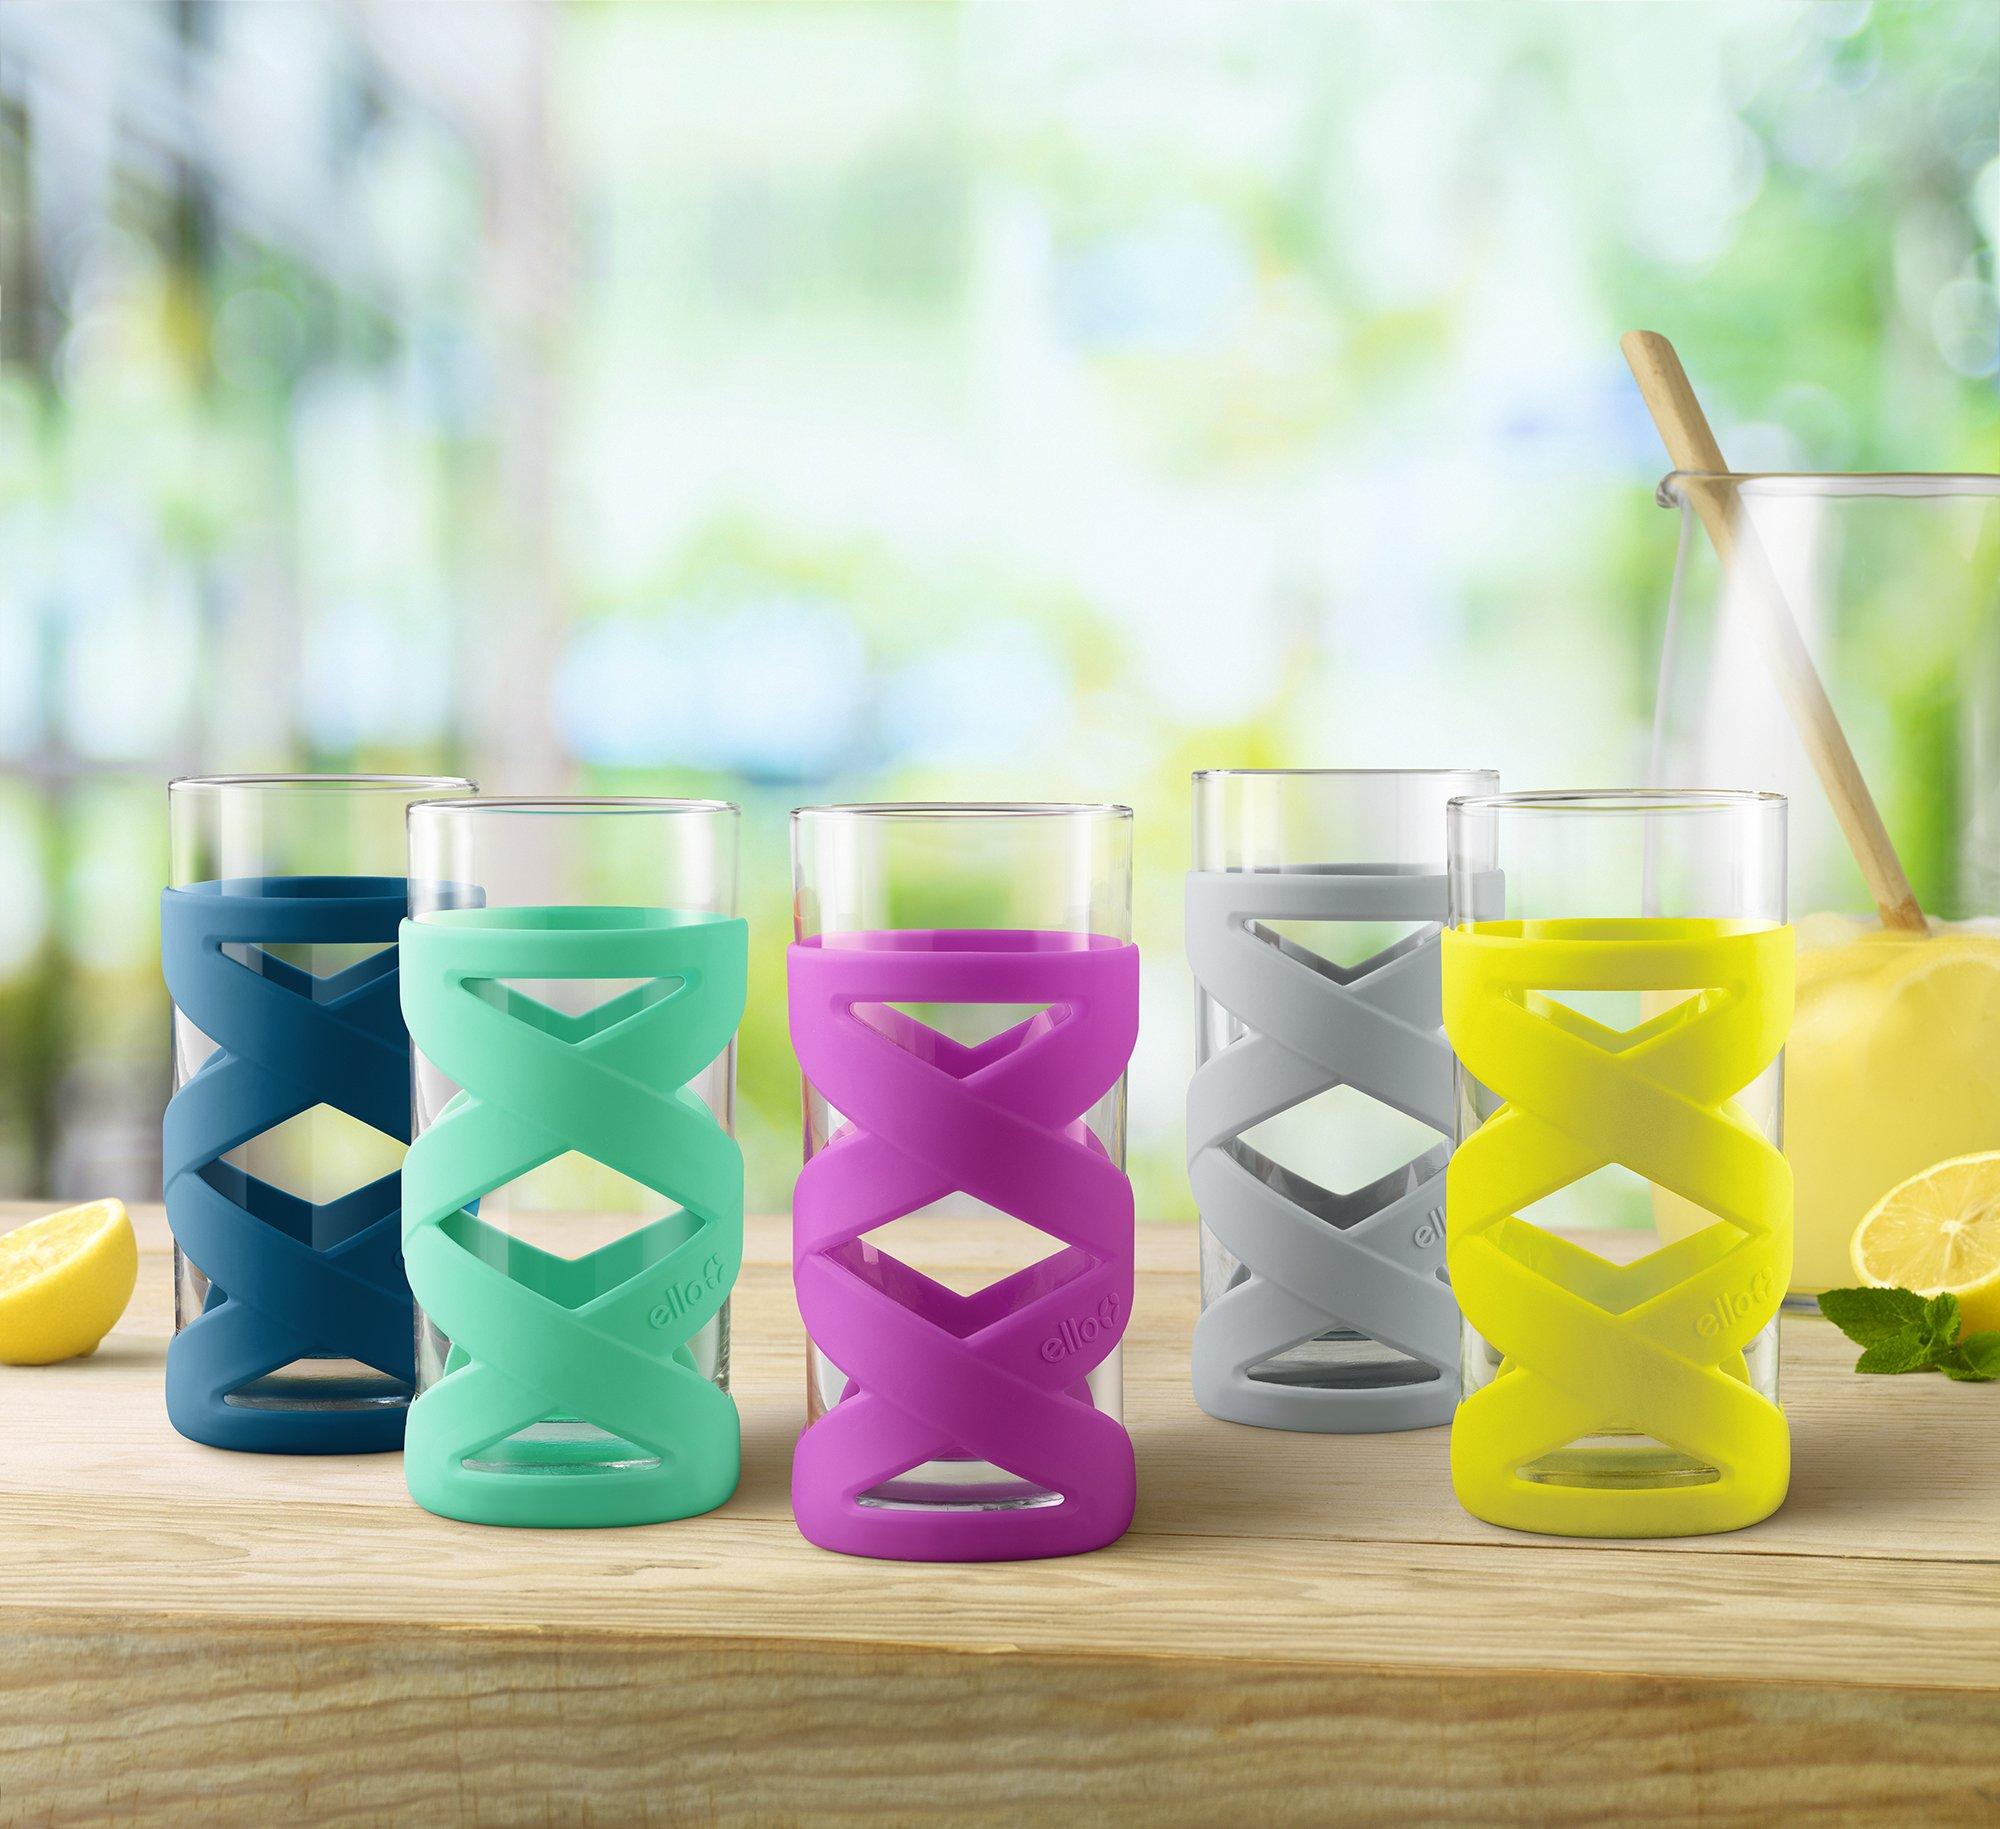 Ello Tallboy 8pc Silicone Glassware Set by Ello (Image #3)